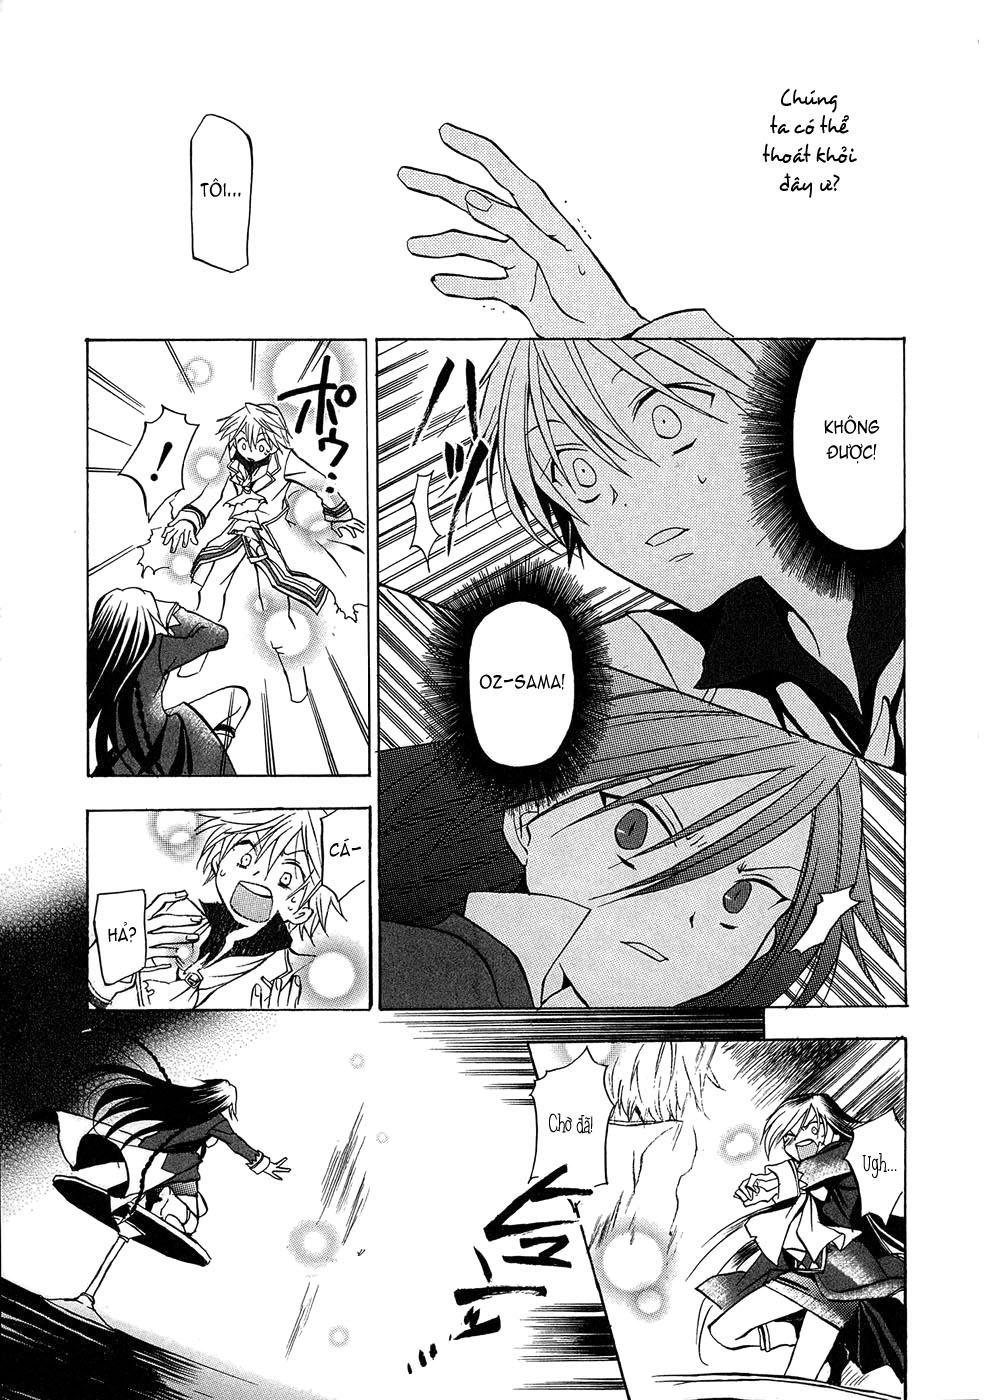 Pandora Hearts chương 003 - retrace: iii prisoner & alichino trang 18